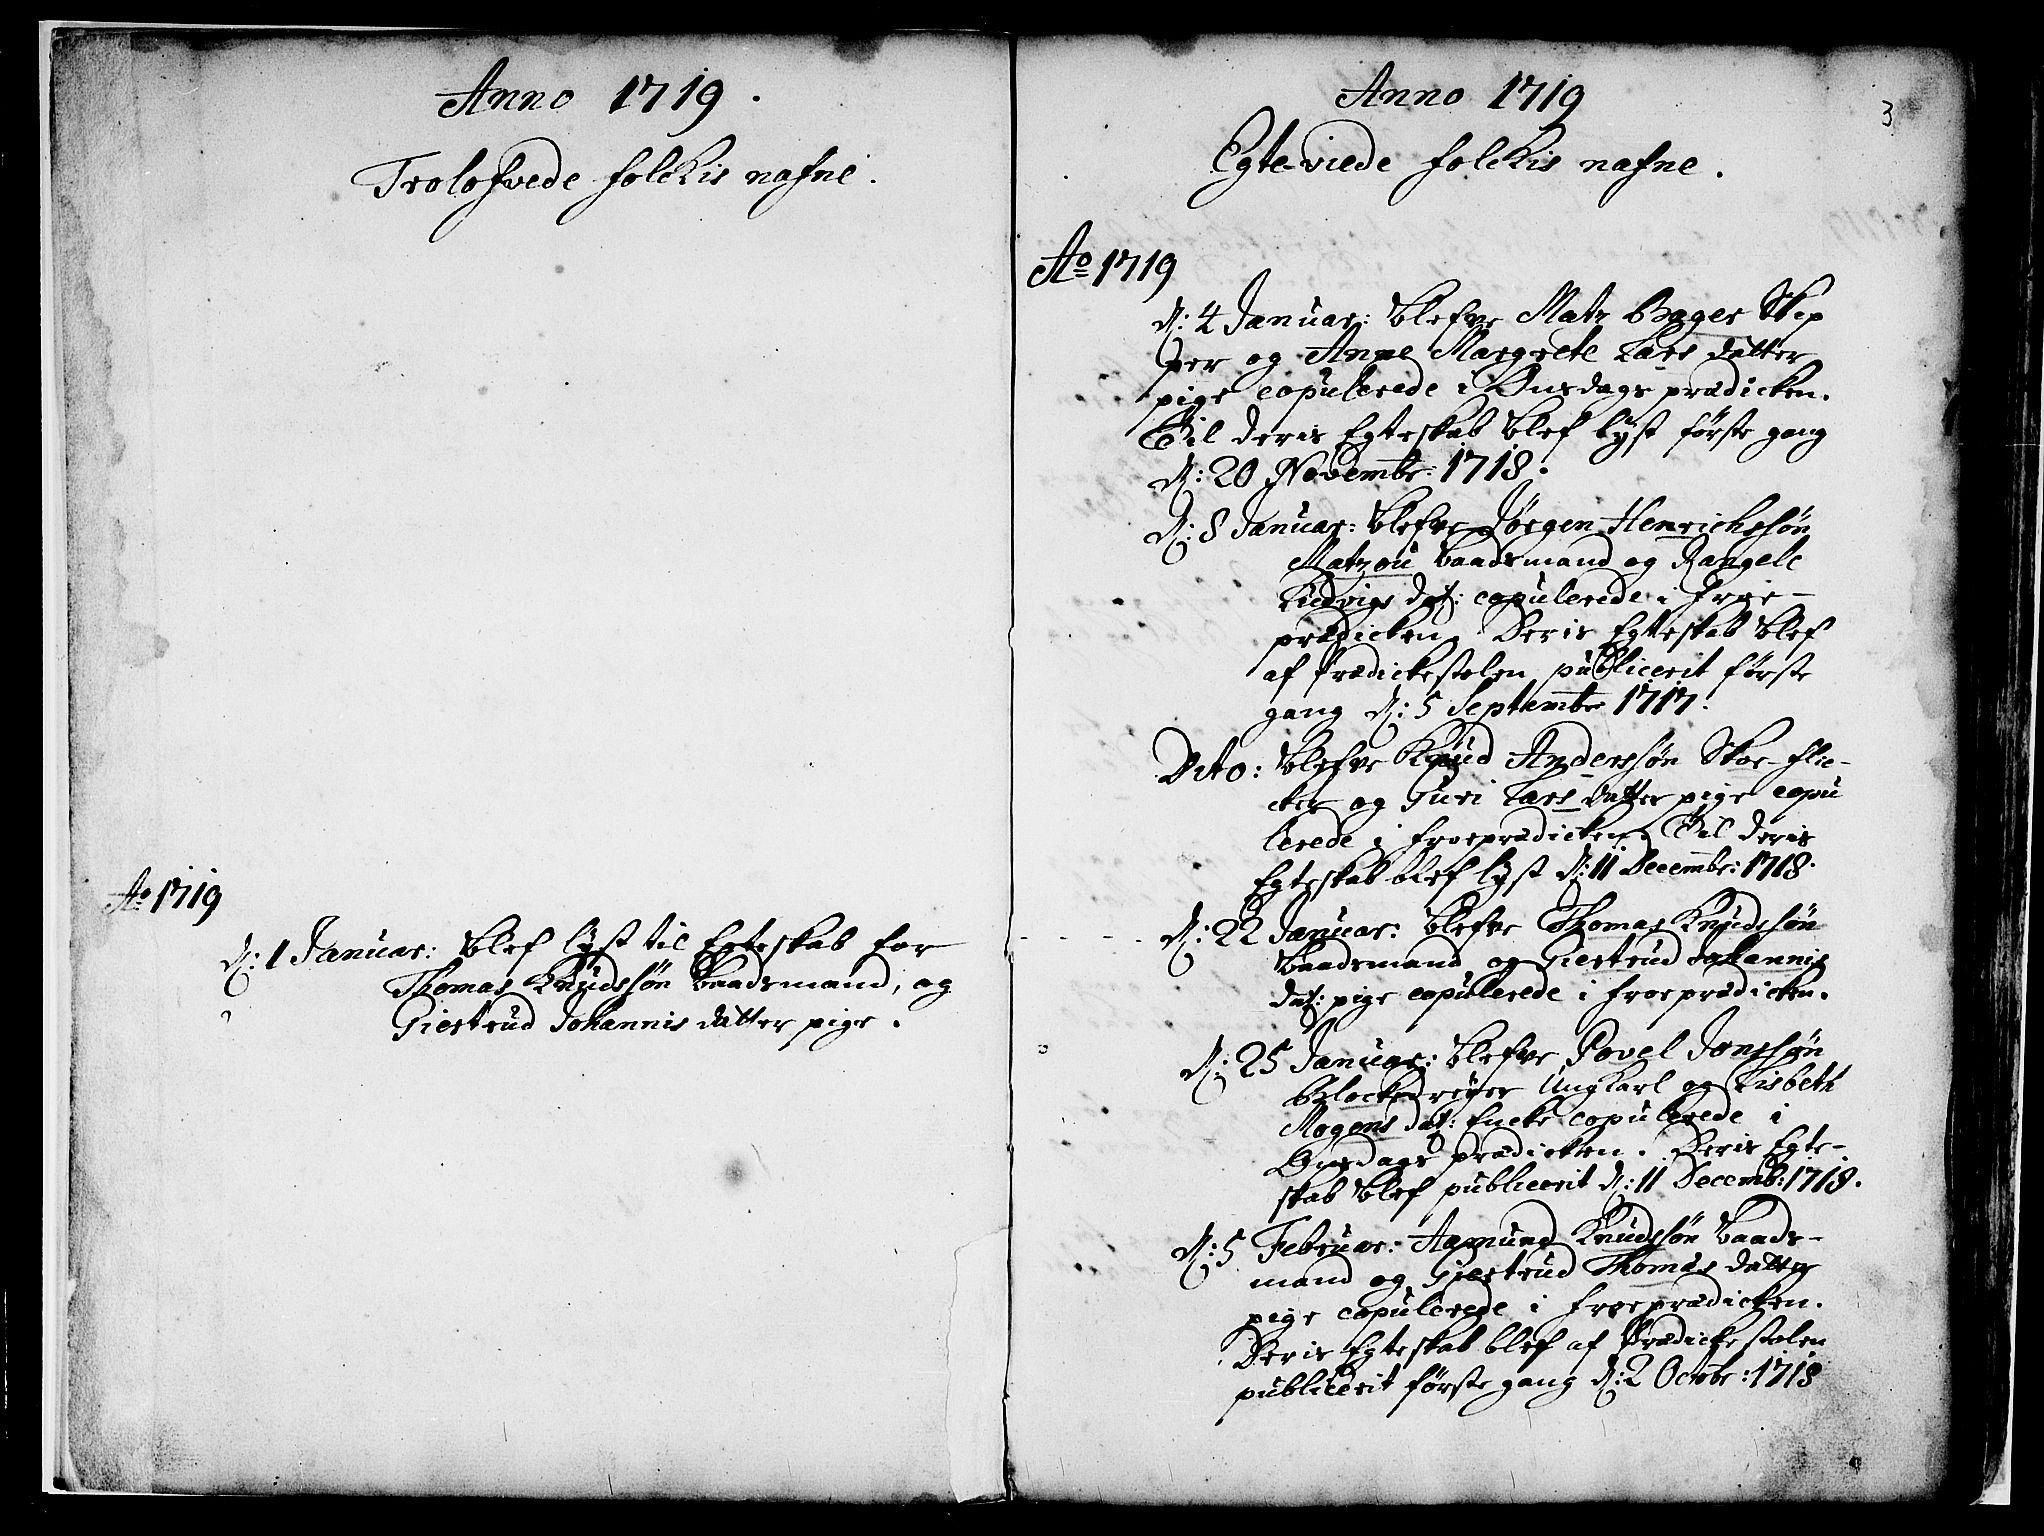 SAB, Nykirken Sokneprestembete, H/Haa: Ministerialbok nr. A 7, 1719-1781, s. 3